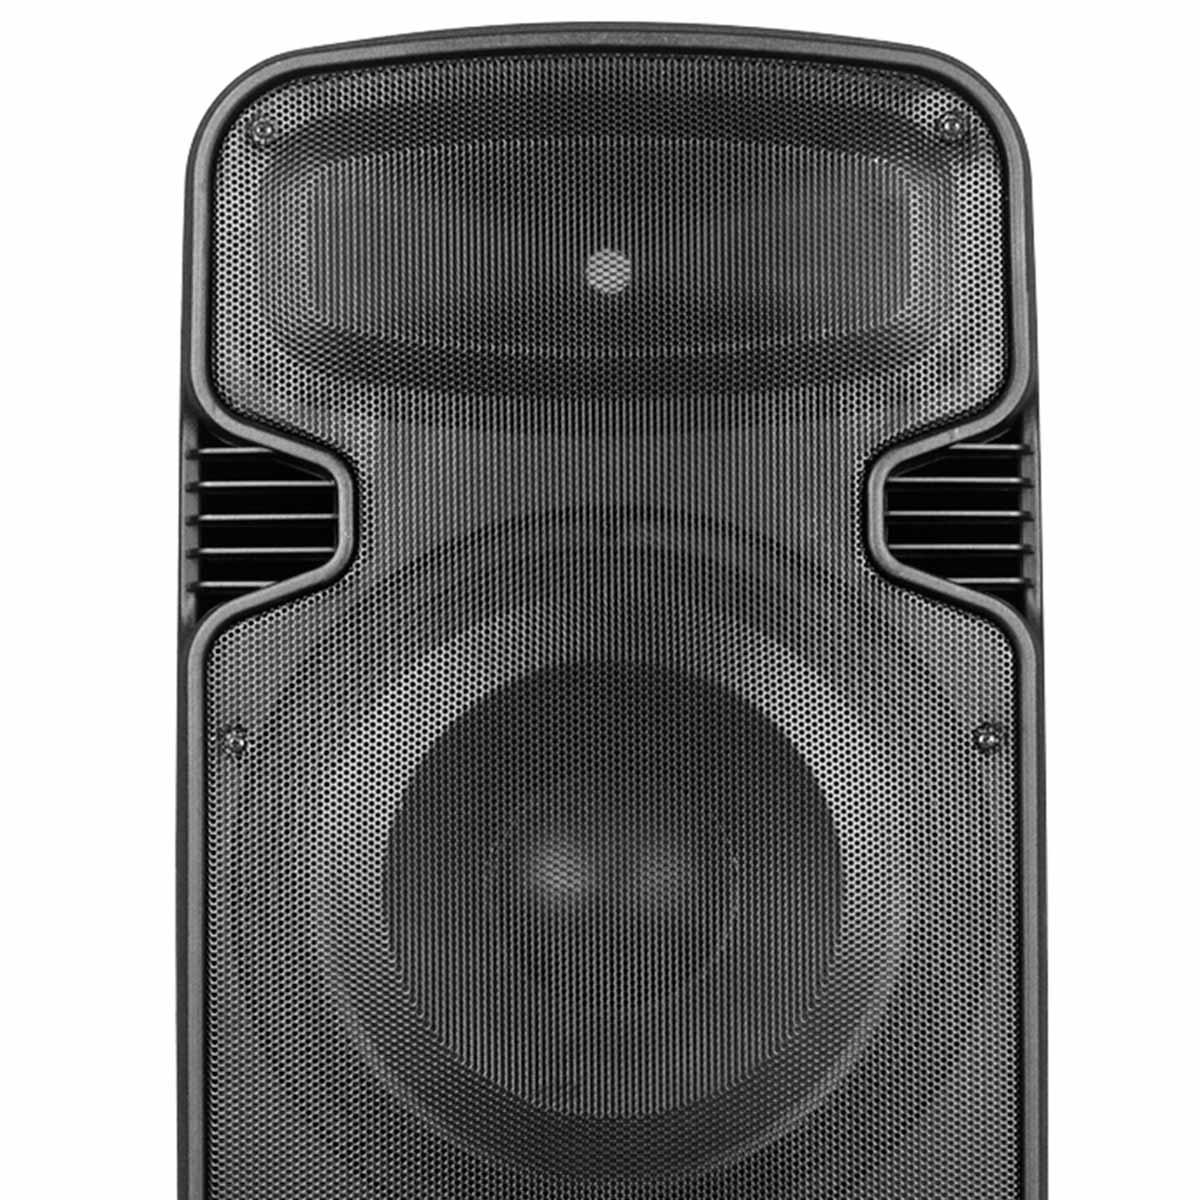 EvodBravery215 - Caixa Ativa 450W c/ Bluetooth e USB Evod Bravery 215 - Novik Neo